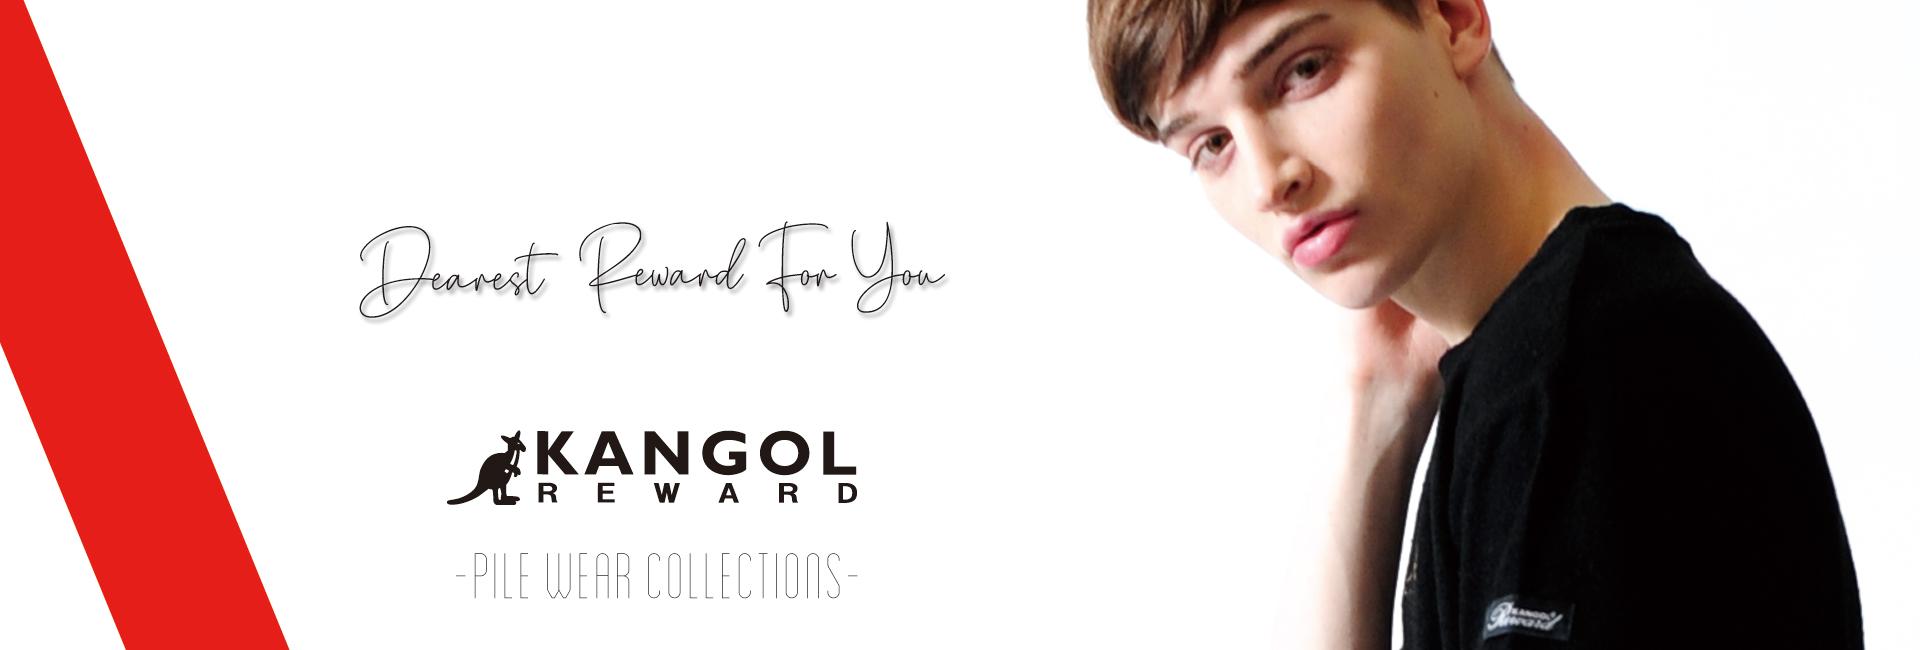 KANGOL REWARD メンズ パイルアイテム